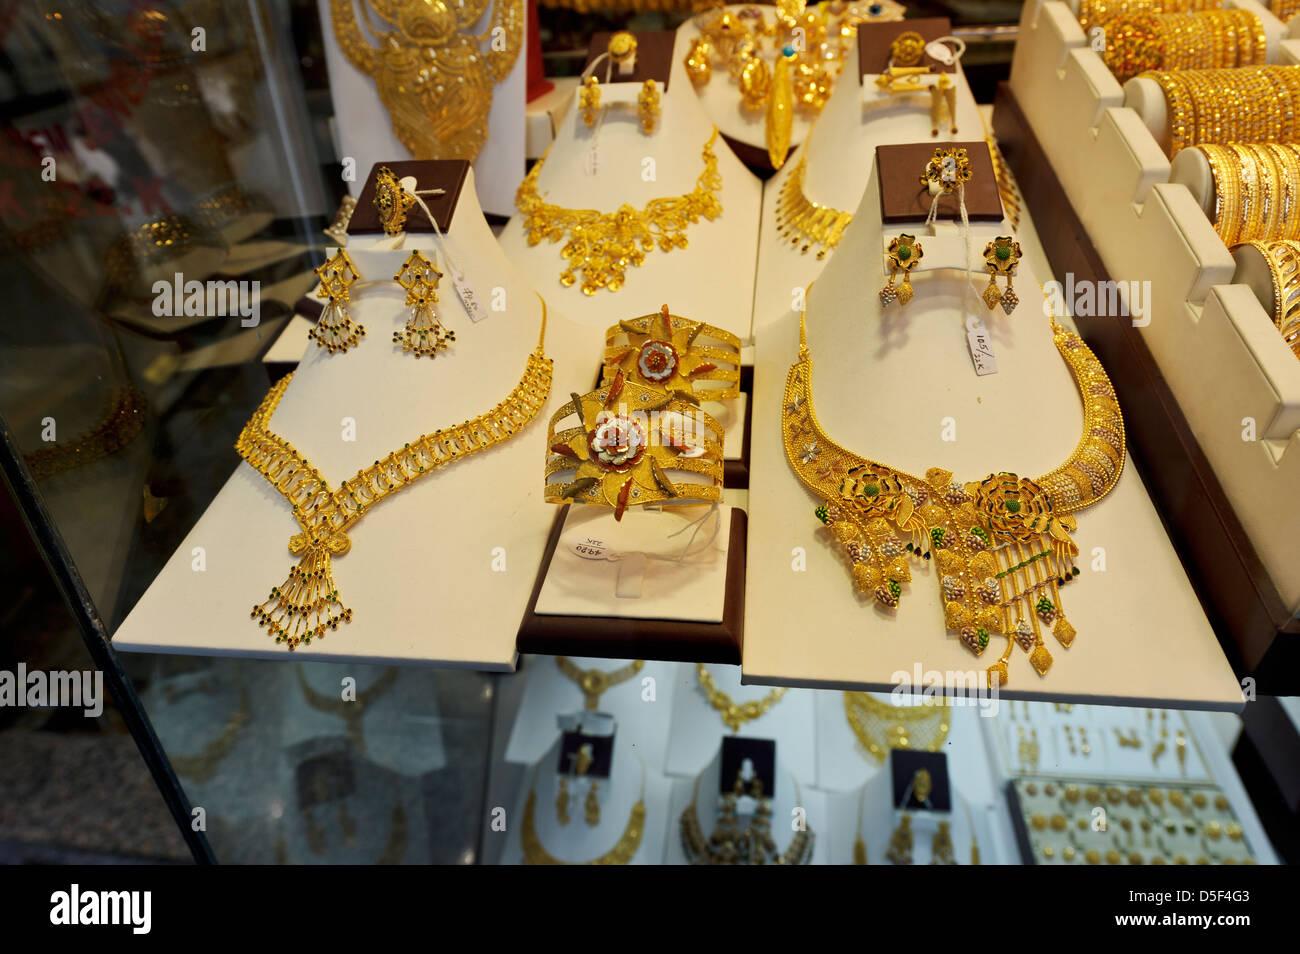 Gold sales Dubai Binary options free Dubai